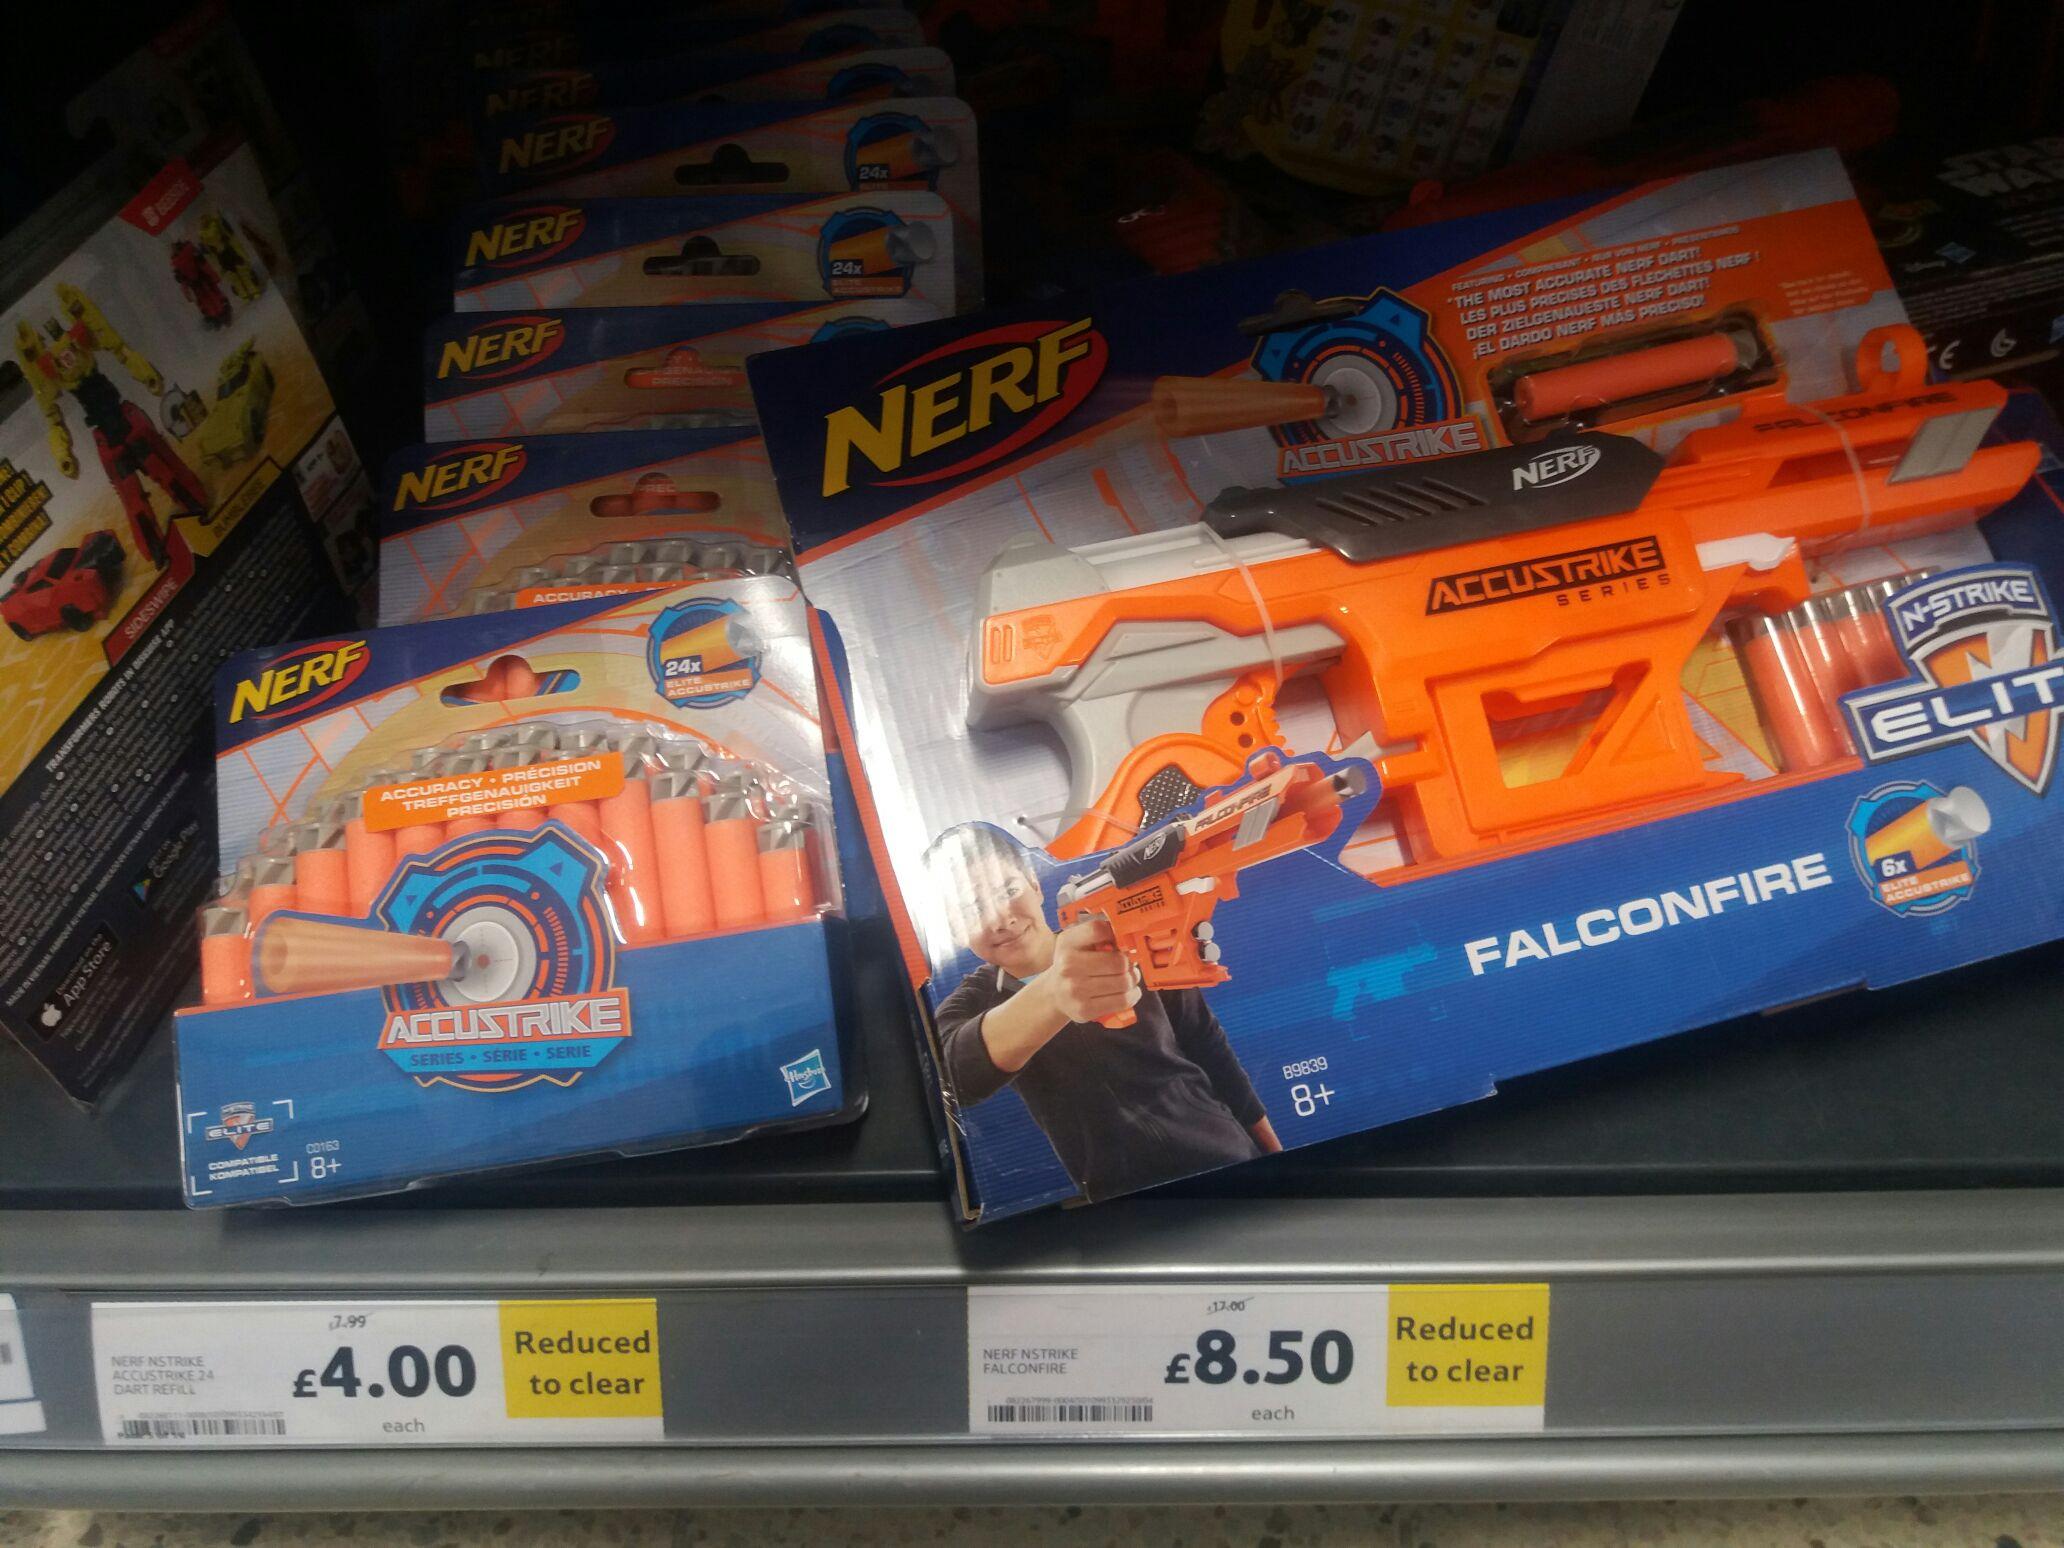 NERF accustrike falconfire @ Tesco Lichfeild RTC